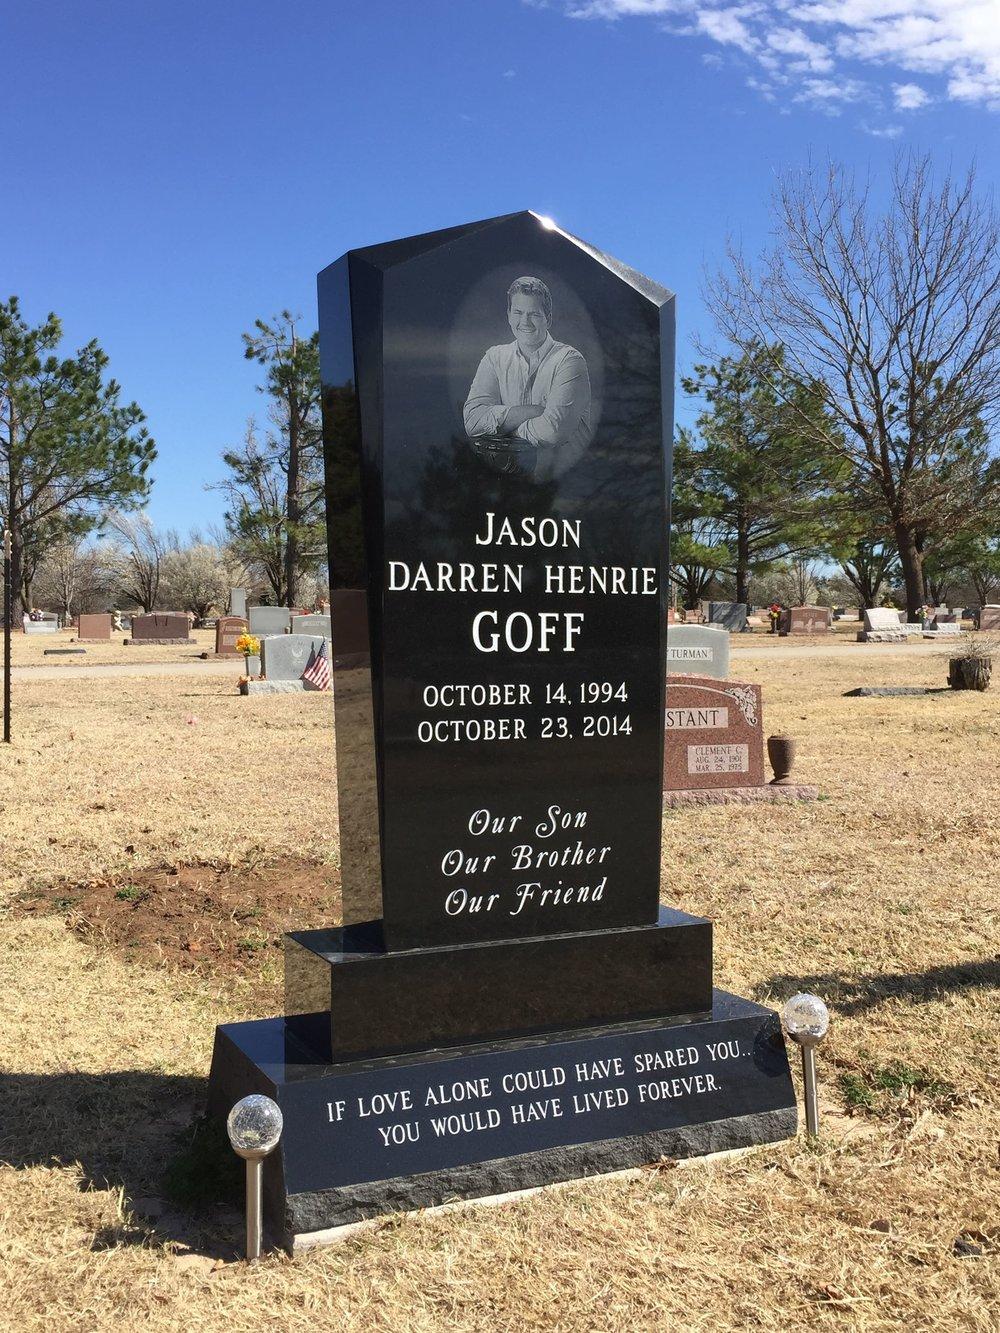 7. Gracelawn Cemetery, Edmond Oklahoma